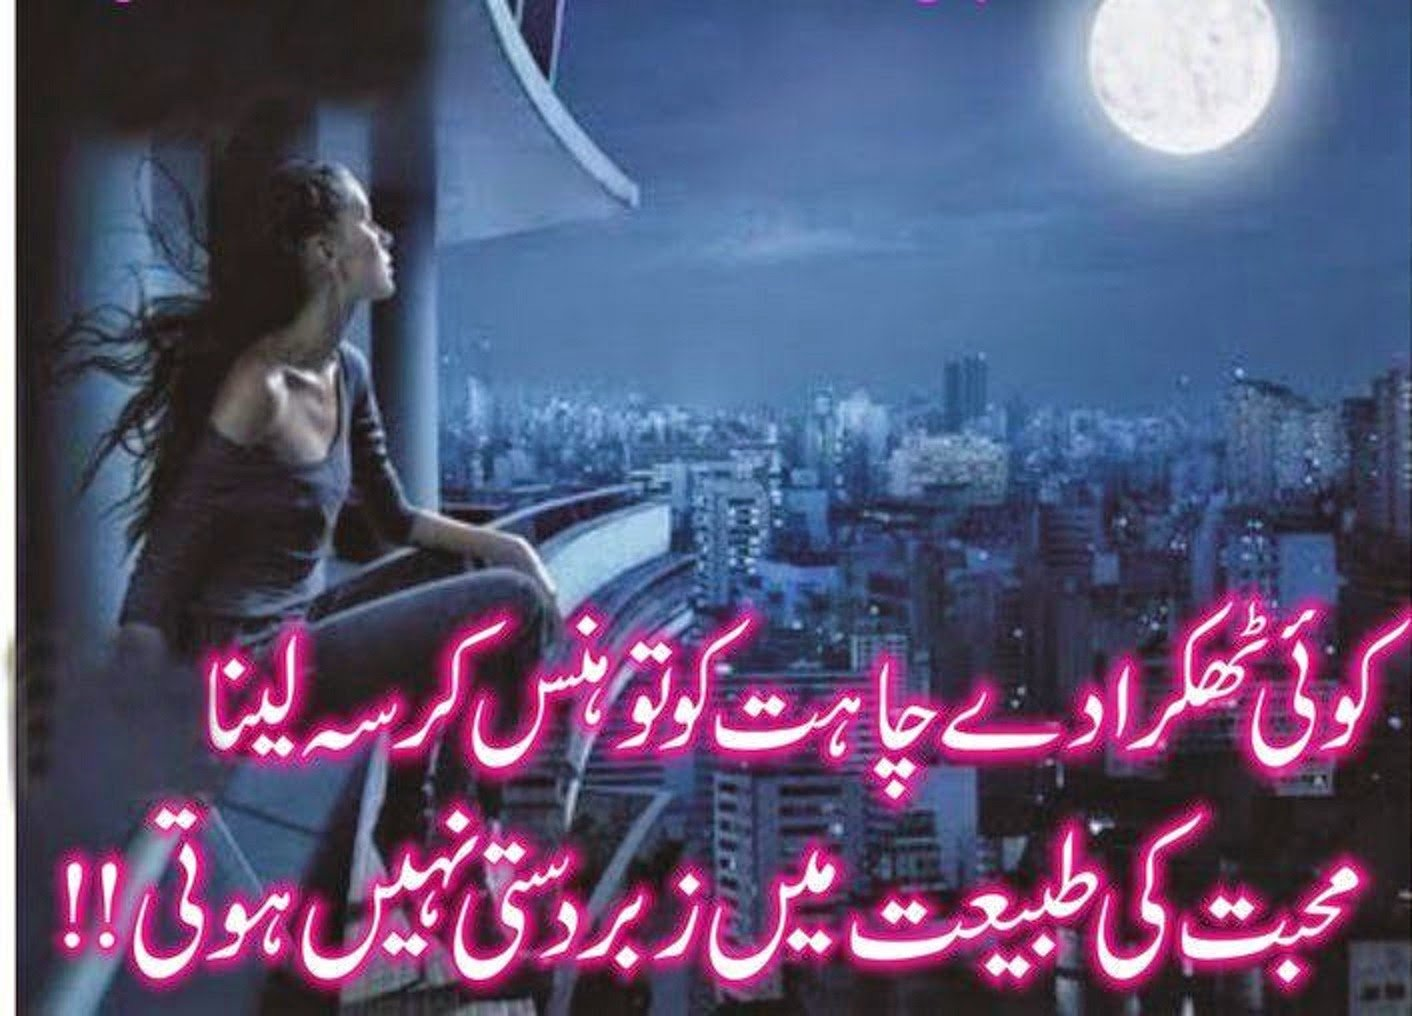 Download HD Wallpapers 3D Beautiful Sad Urdu Poetry HD 1412x1016